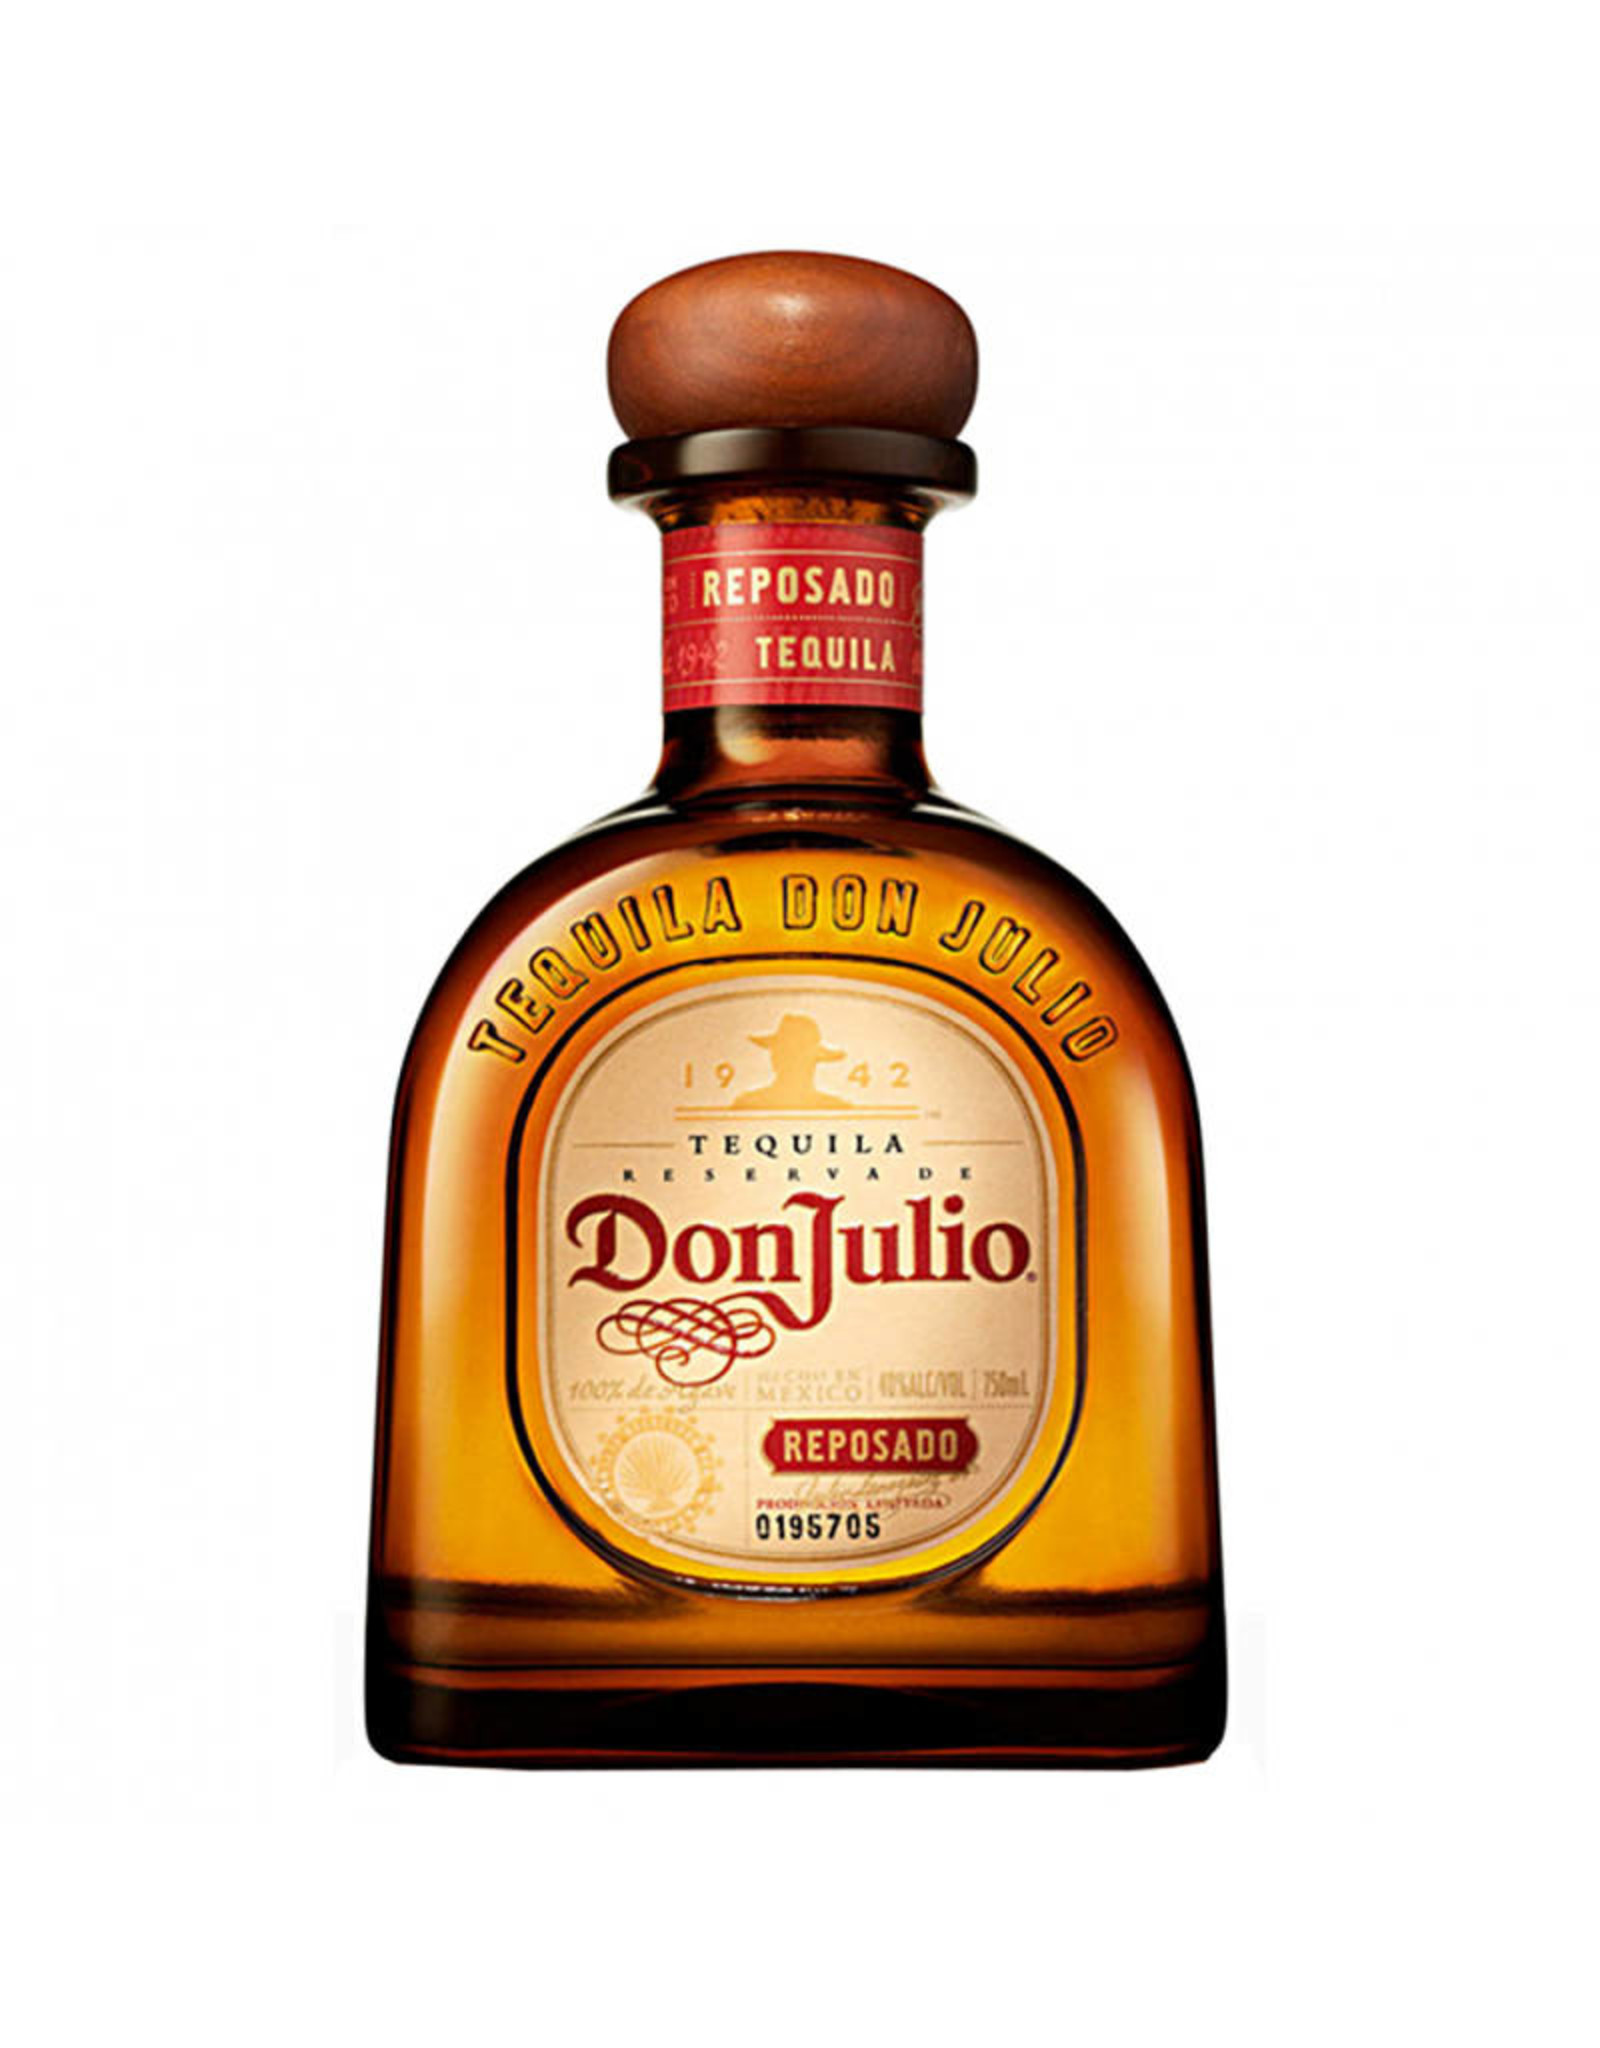 Don Julio Tequila Don Julio Reposado